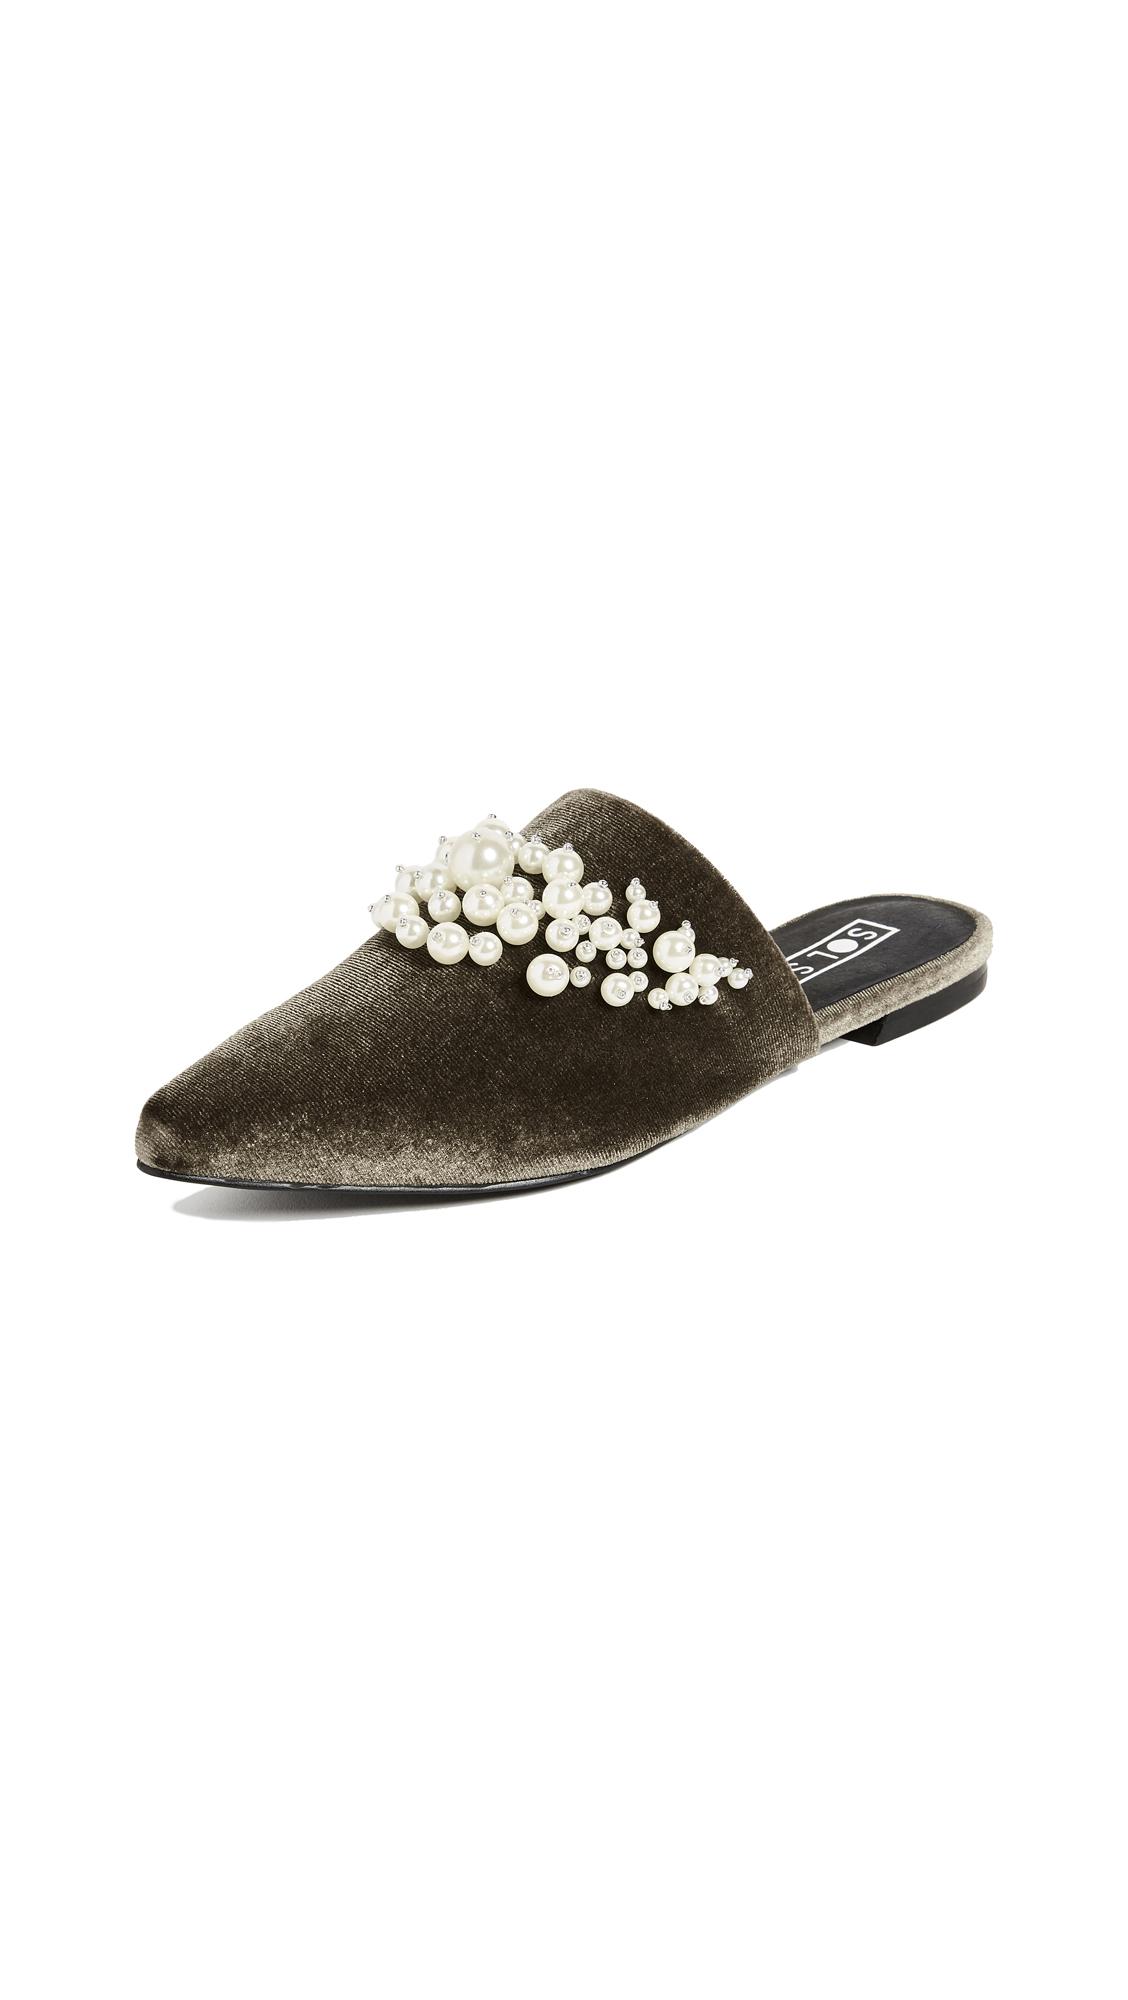 Sol Sana Grace Imitation Pearl Slides - Moss